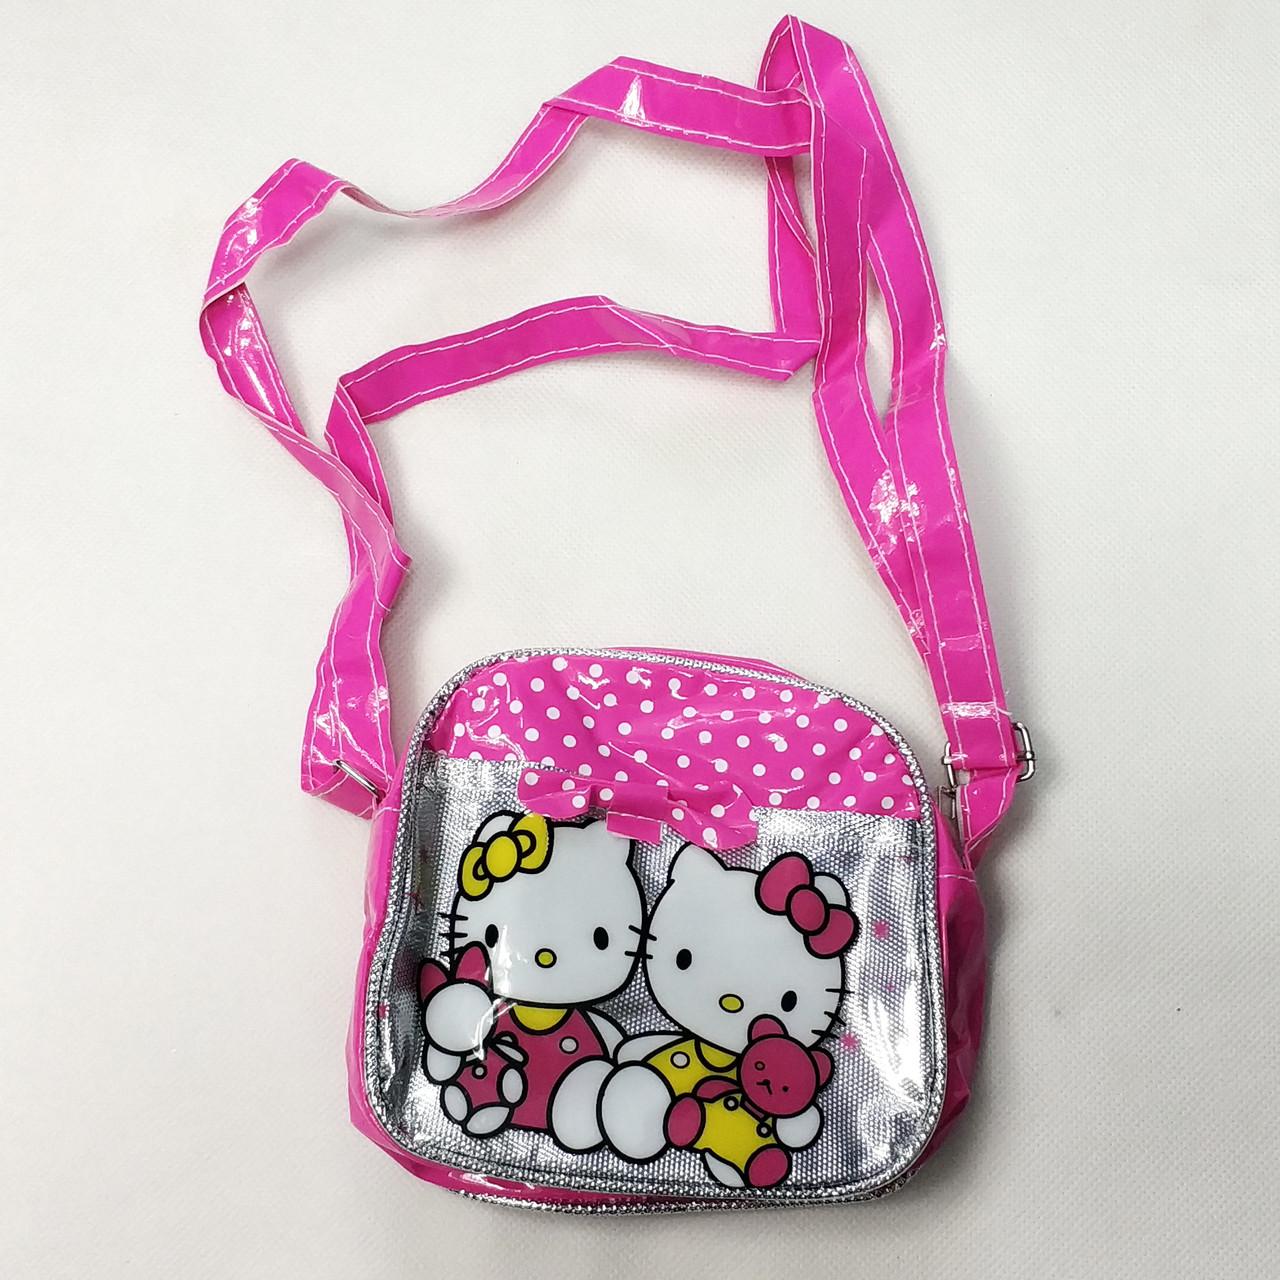 Детская сумка сумочка Hello Kitty малиновая маленькая лак